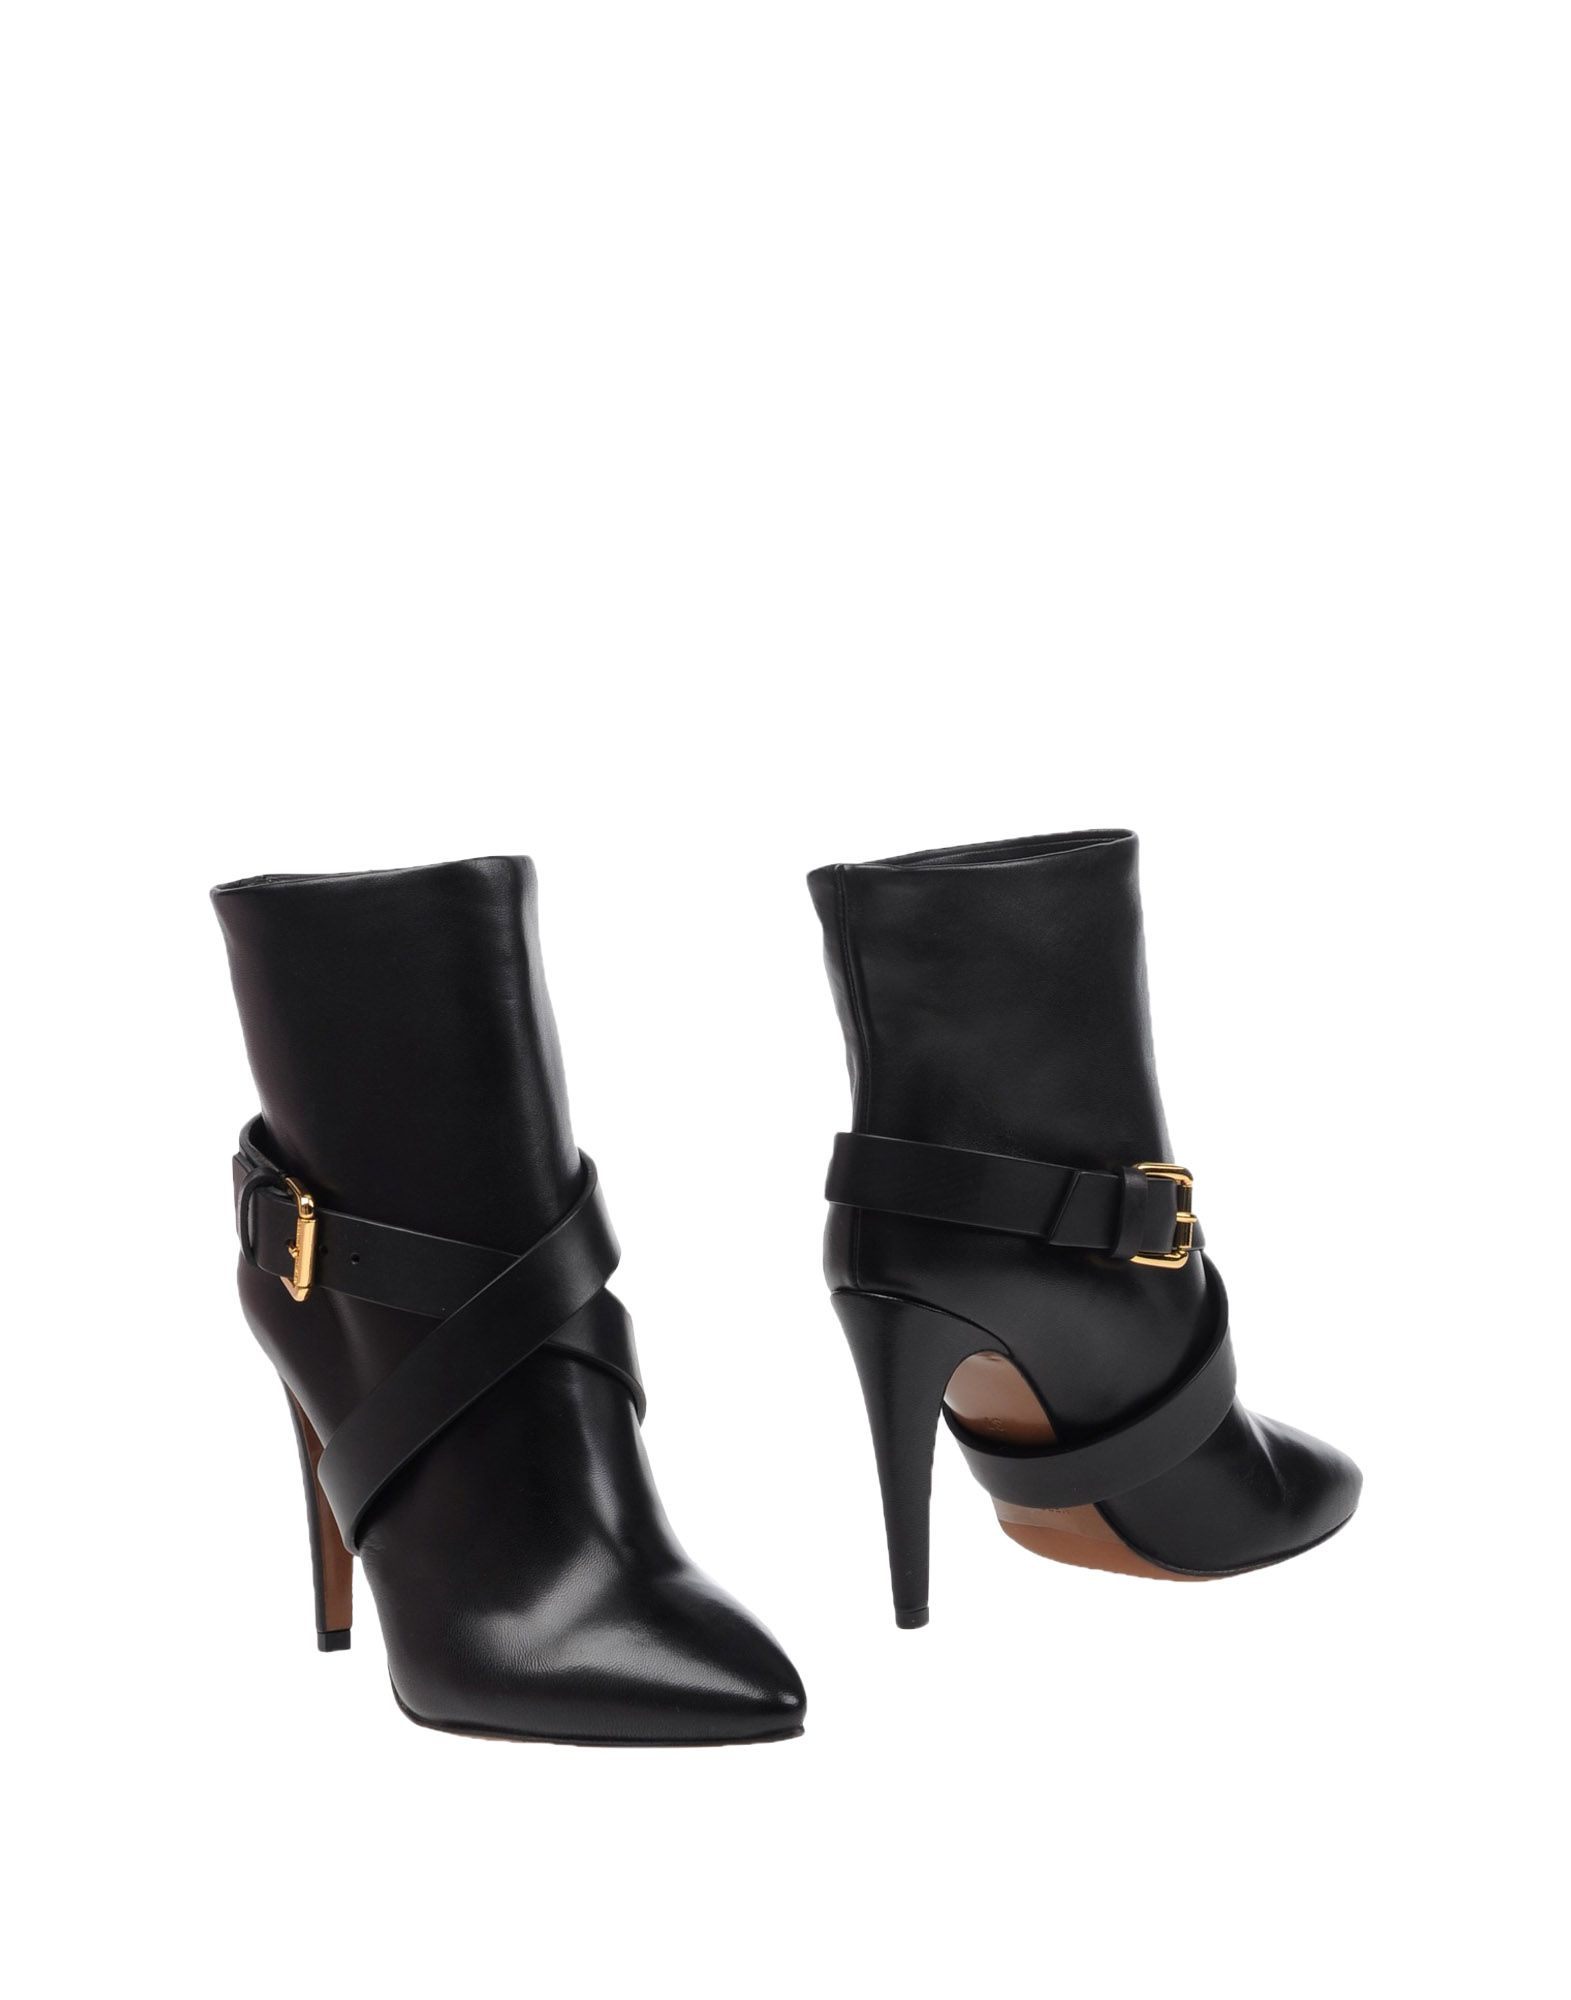 L' Autre Chose Stiefelette Damen Schuhe  11139565JQGut aussehende strapazierfähige Schuhe Damen de8fb4